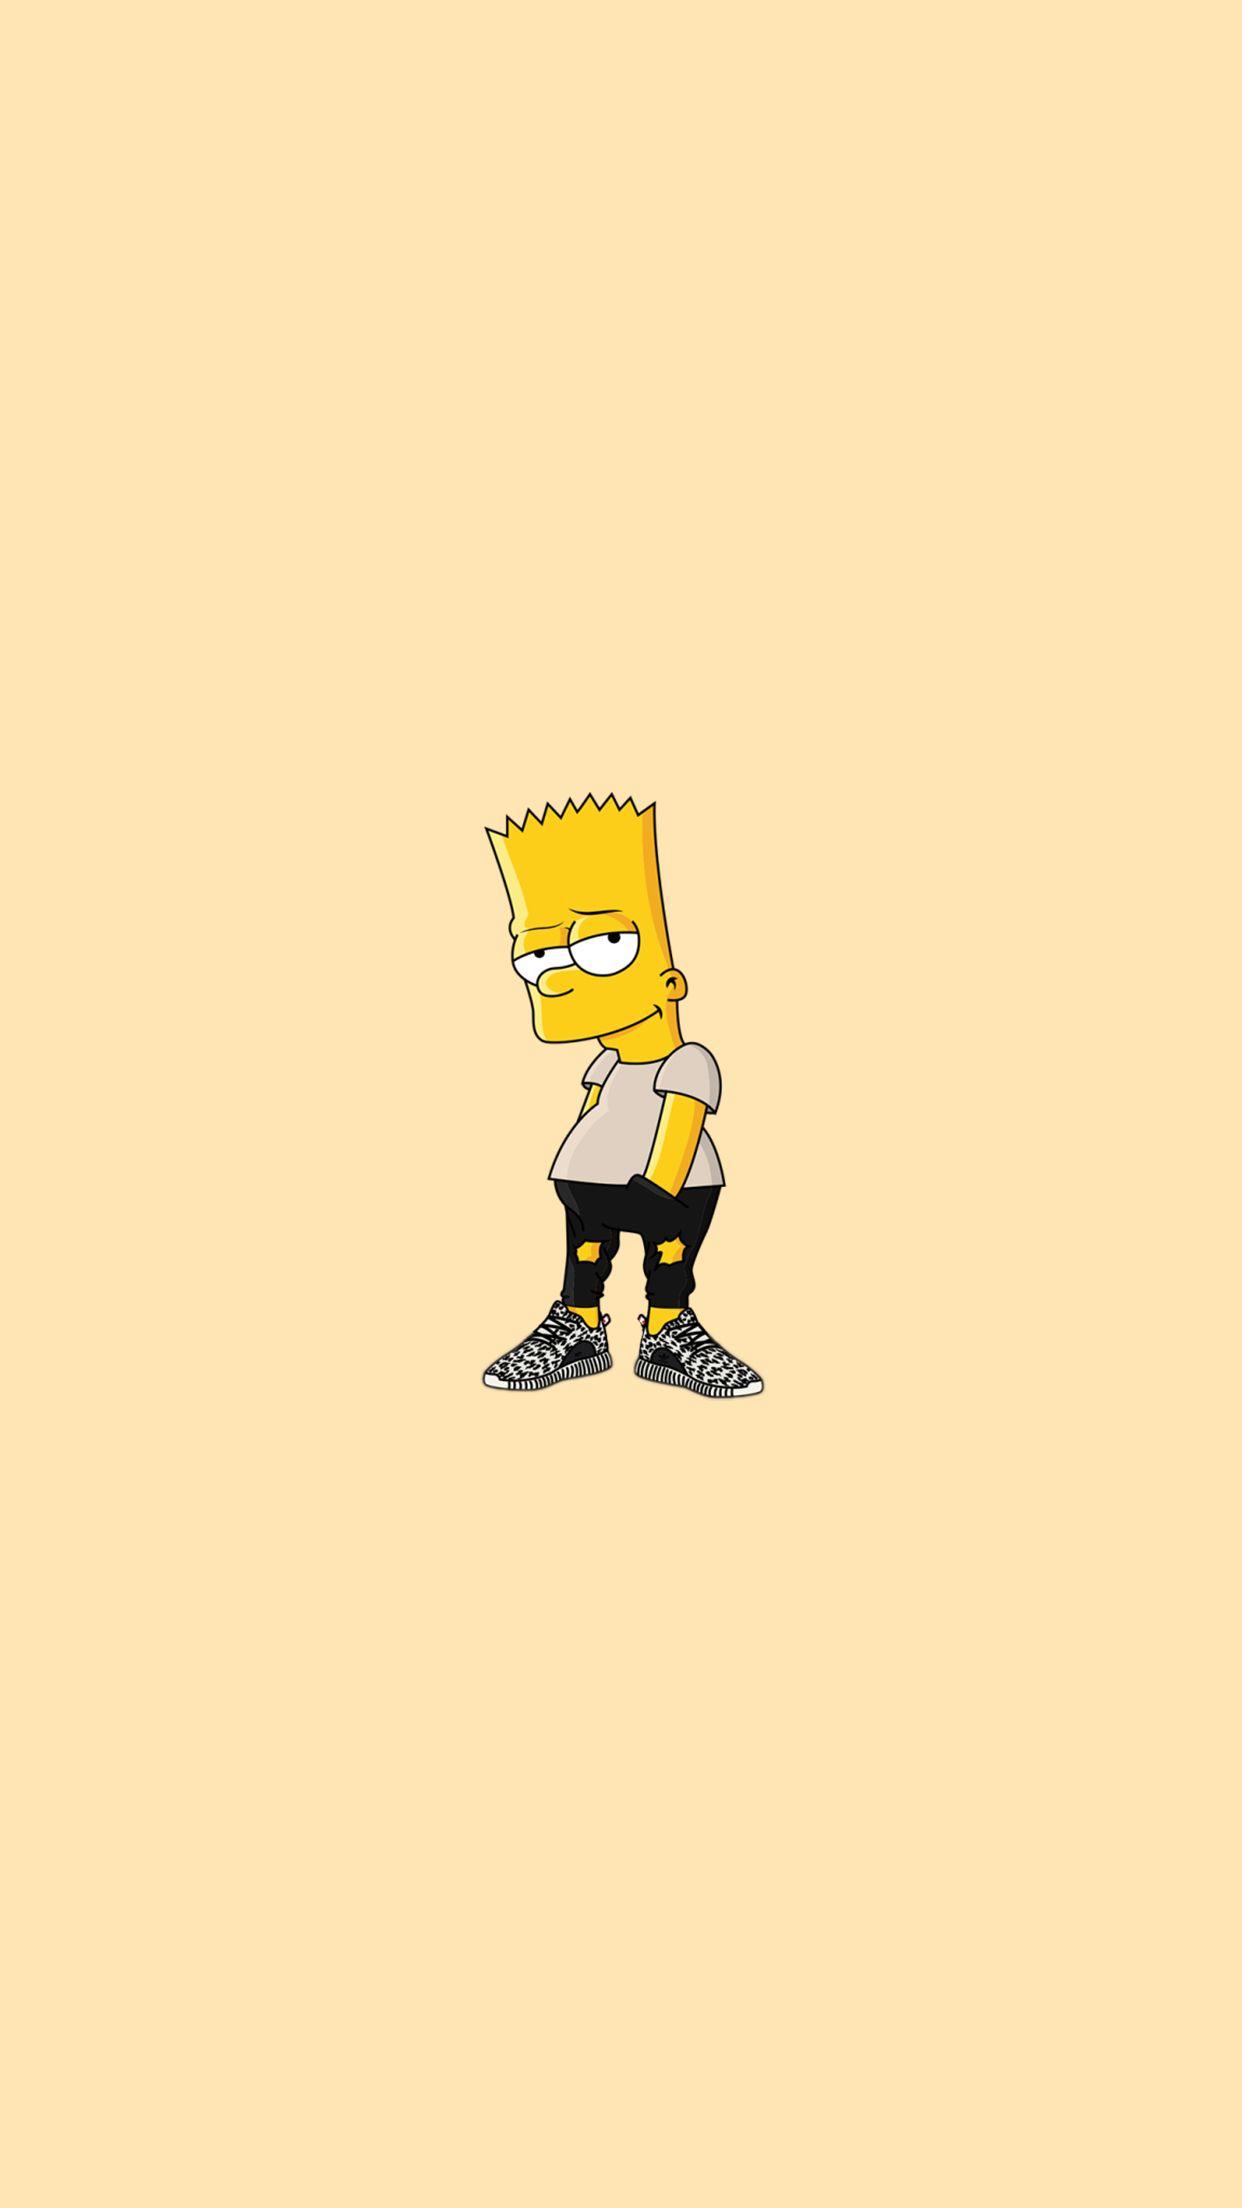 Barte Simpsons Papeis De Parede Tumblr Planos De Fundo Planos De Fundo Tumblr